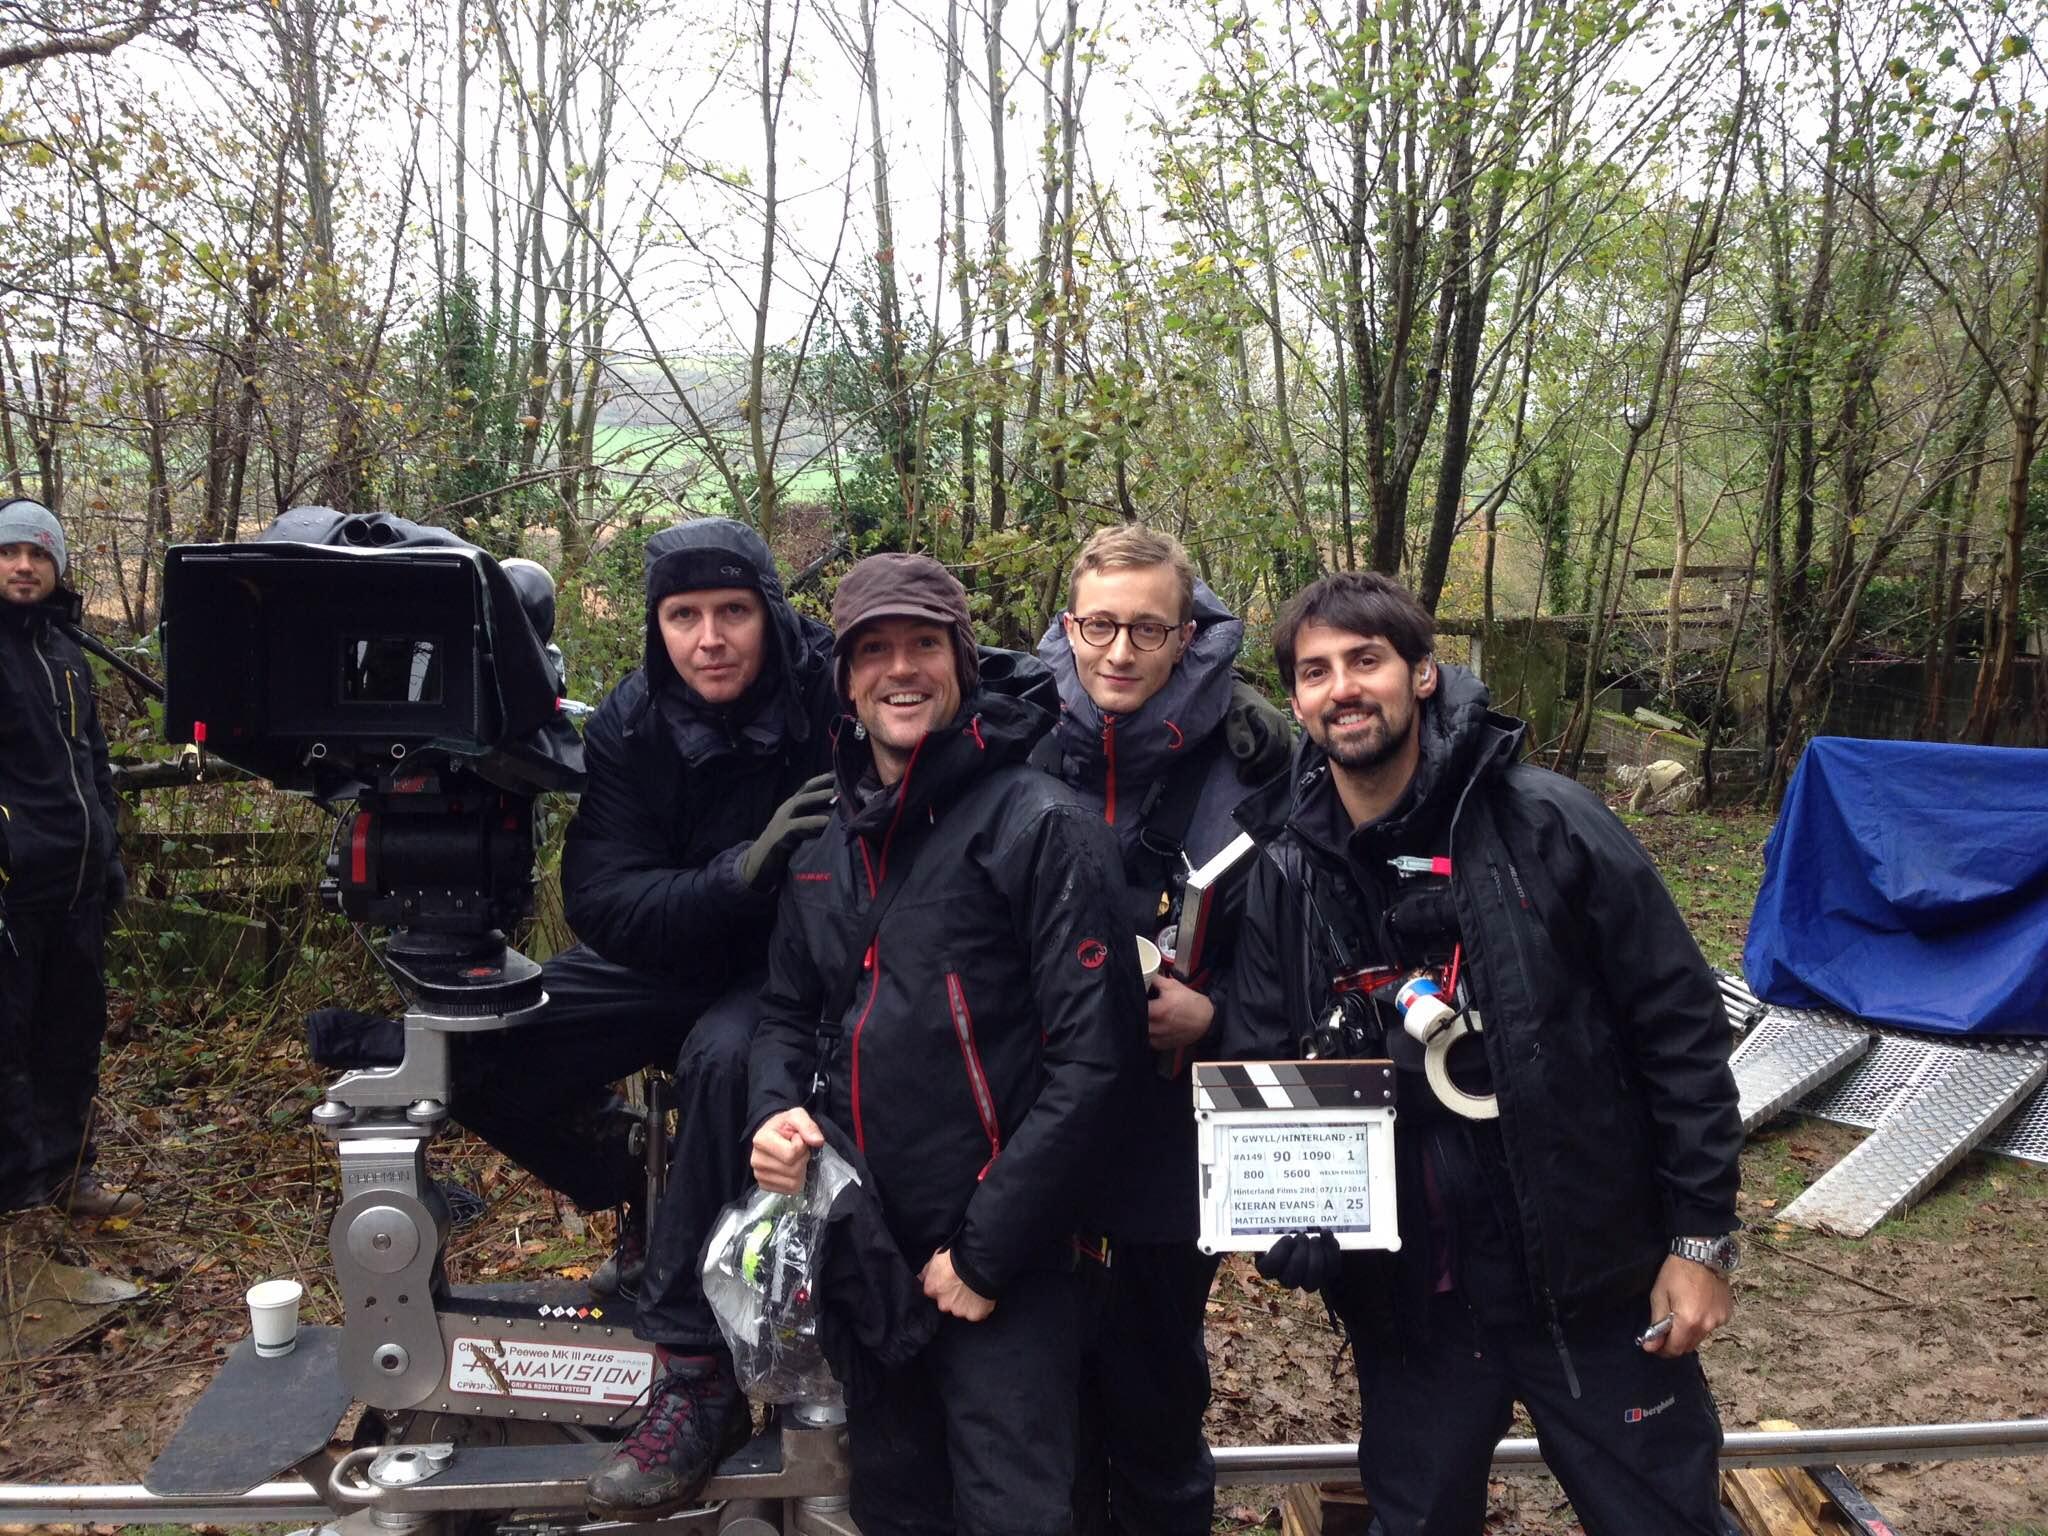 HINTERLAND camera crew